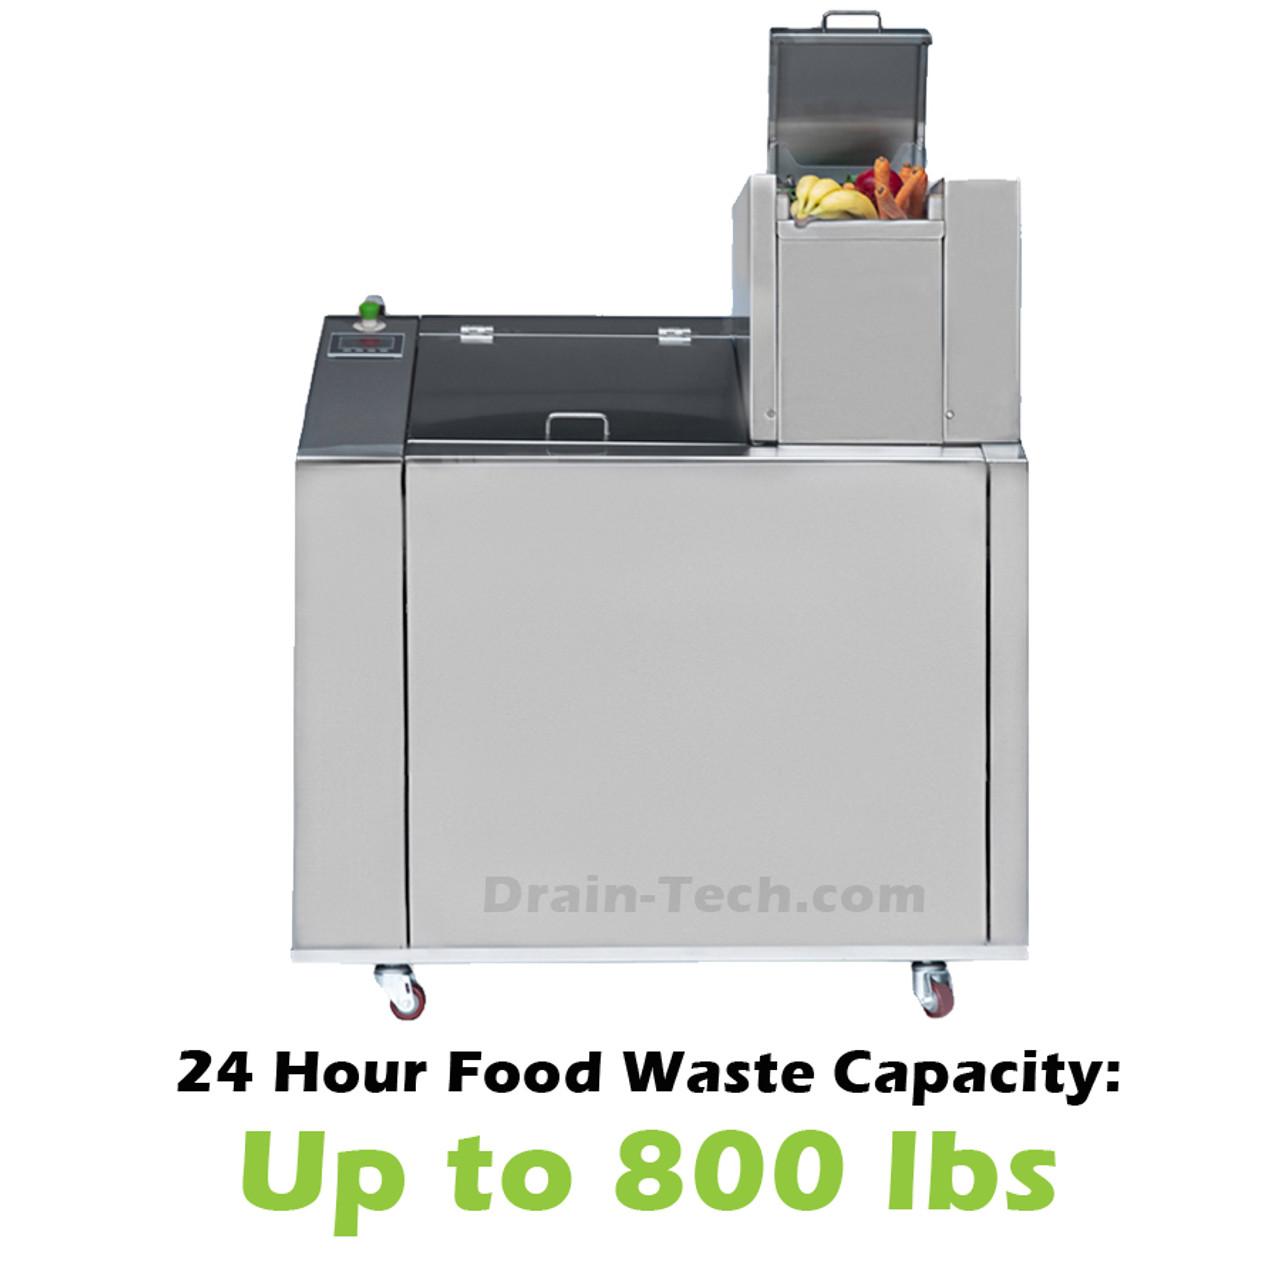 Sapling Food Waste Digester